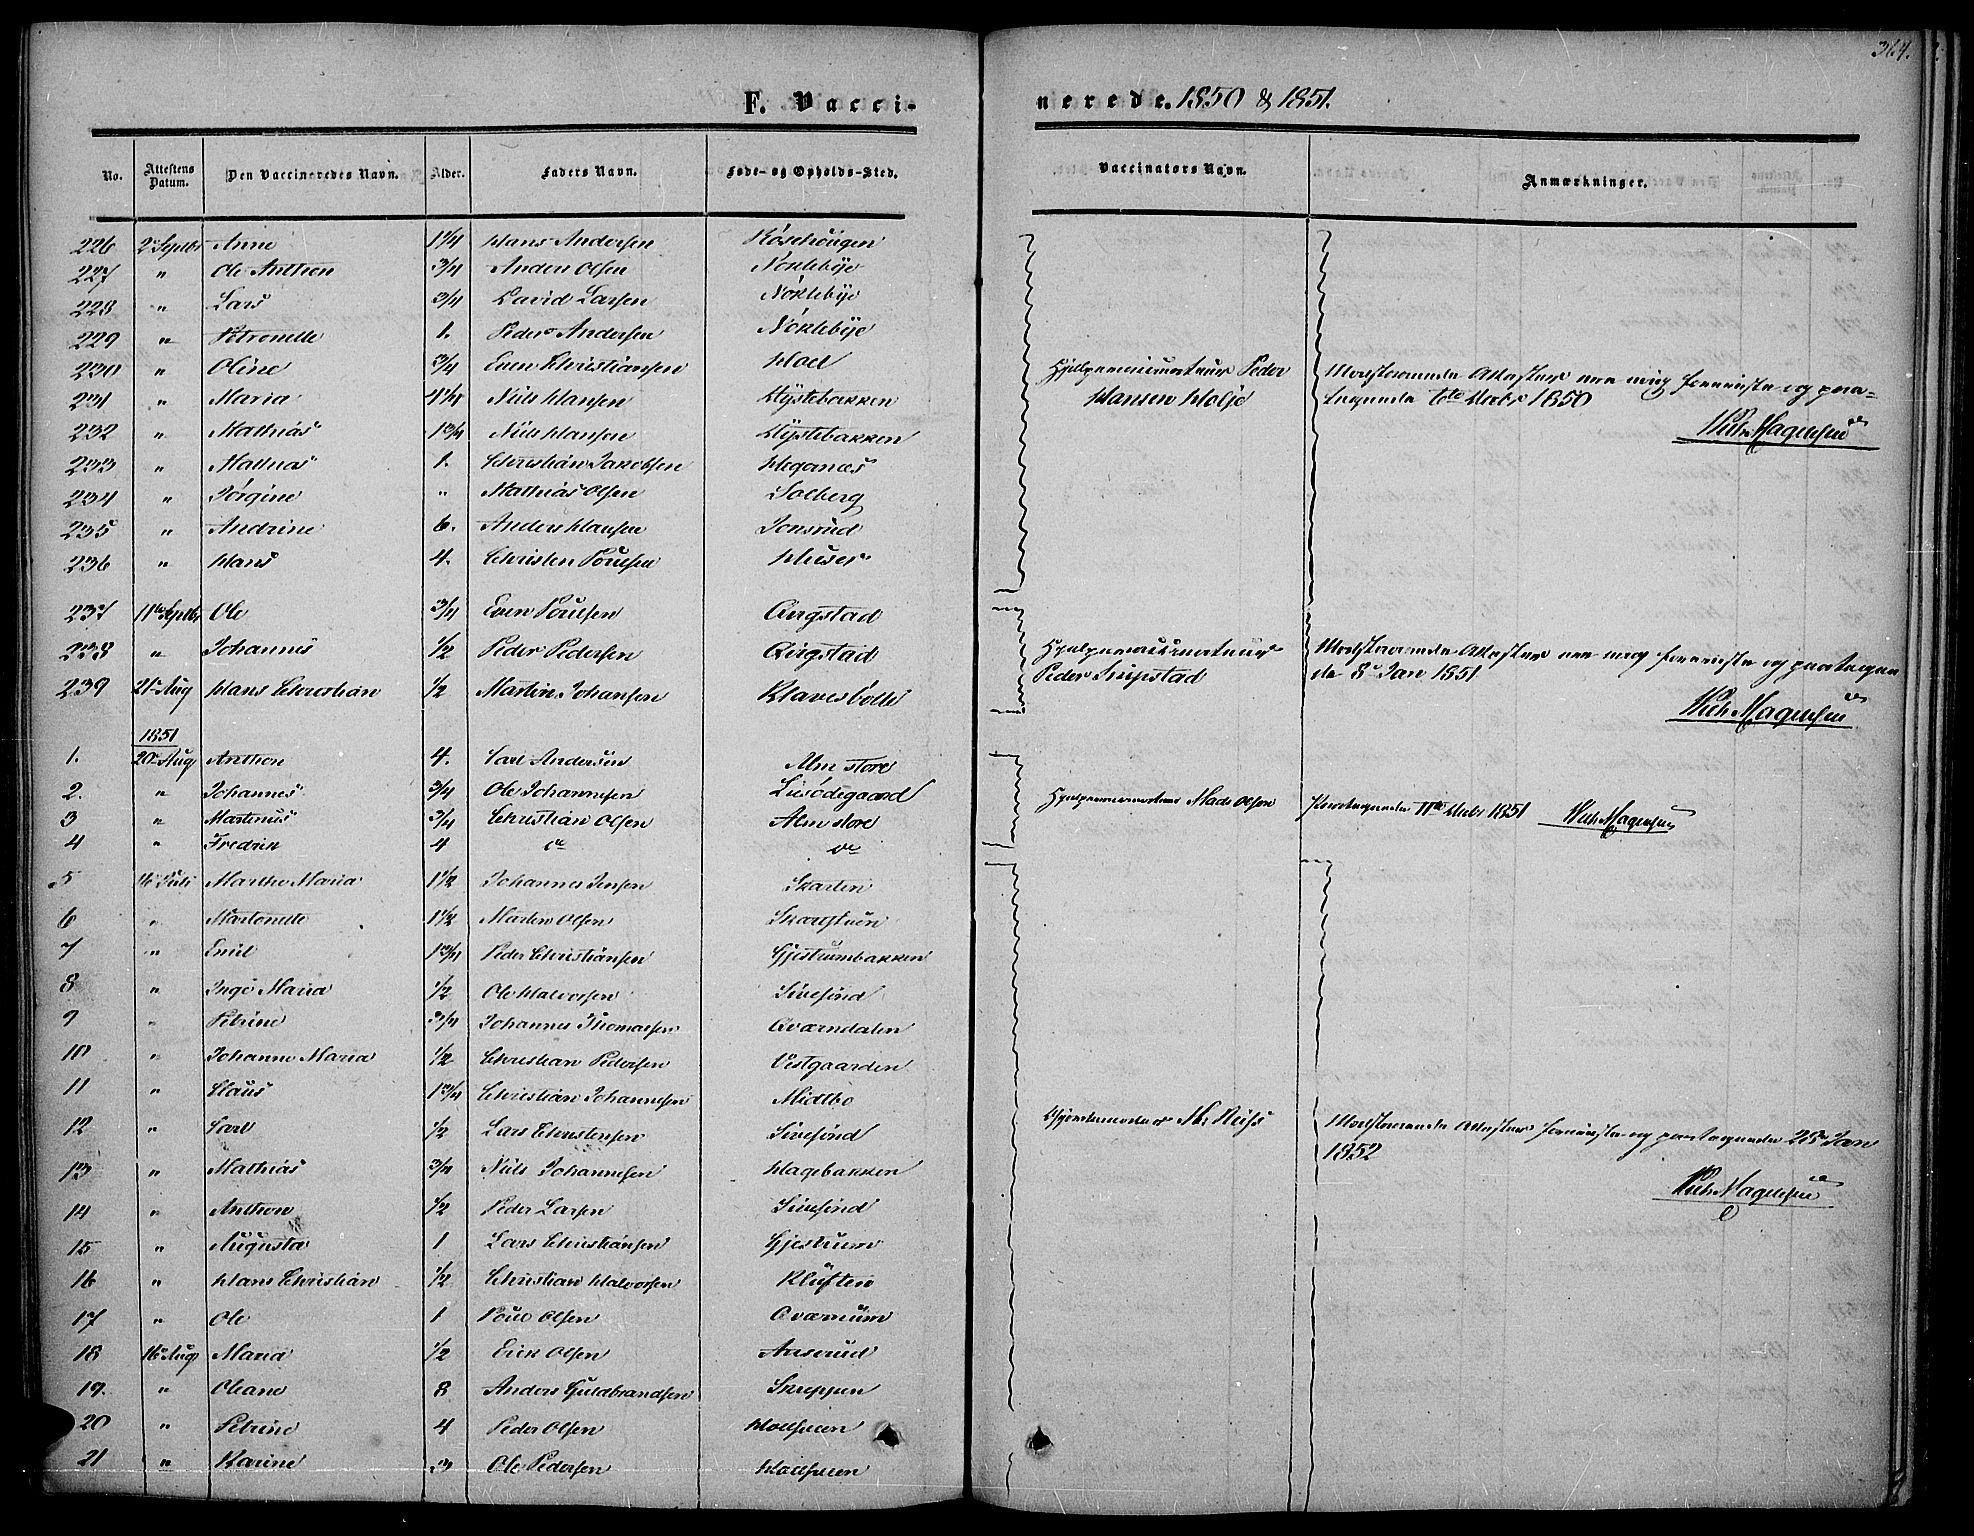 SAH, Vestre Toten prestekontor, H/Ha/Haa/L0005: Ministerialbok nr. 5, 1850-1855, s. 364